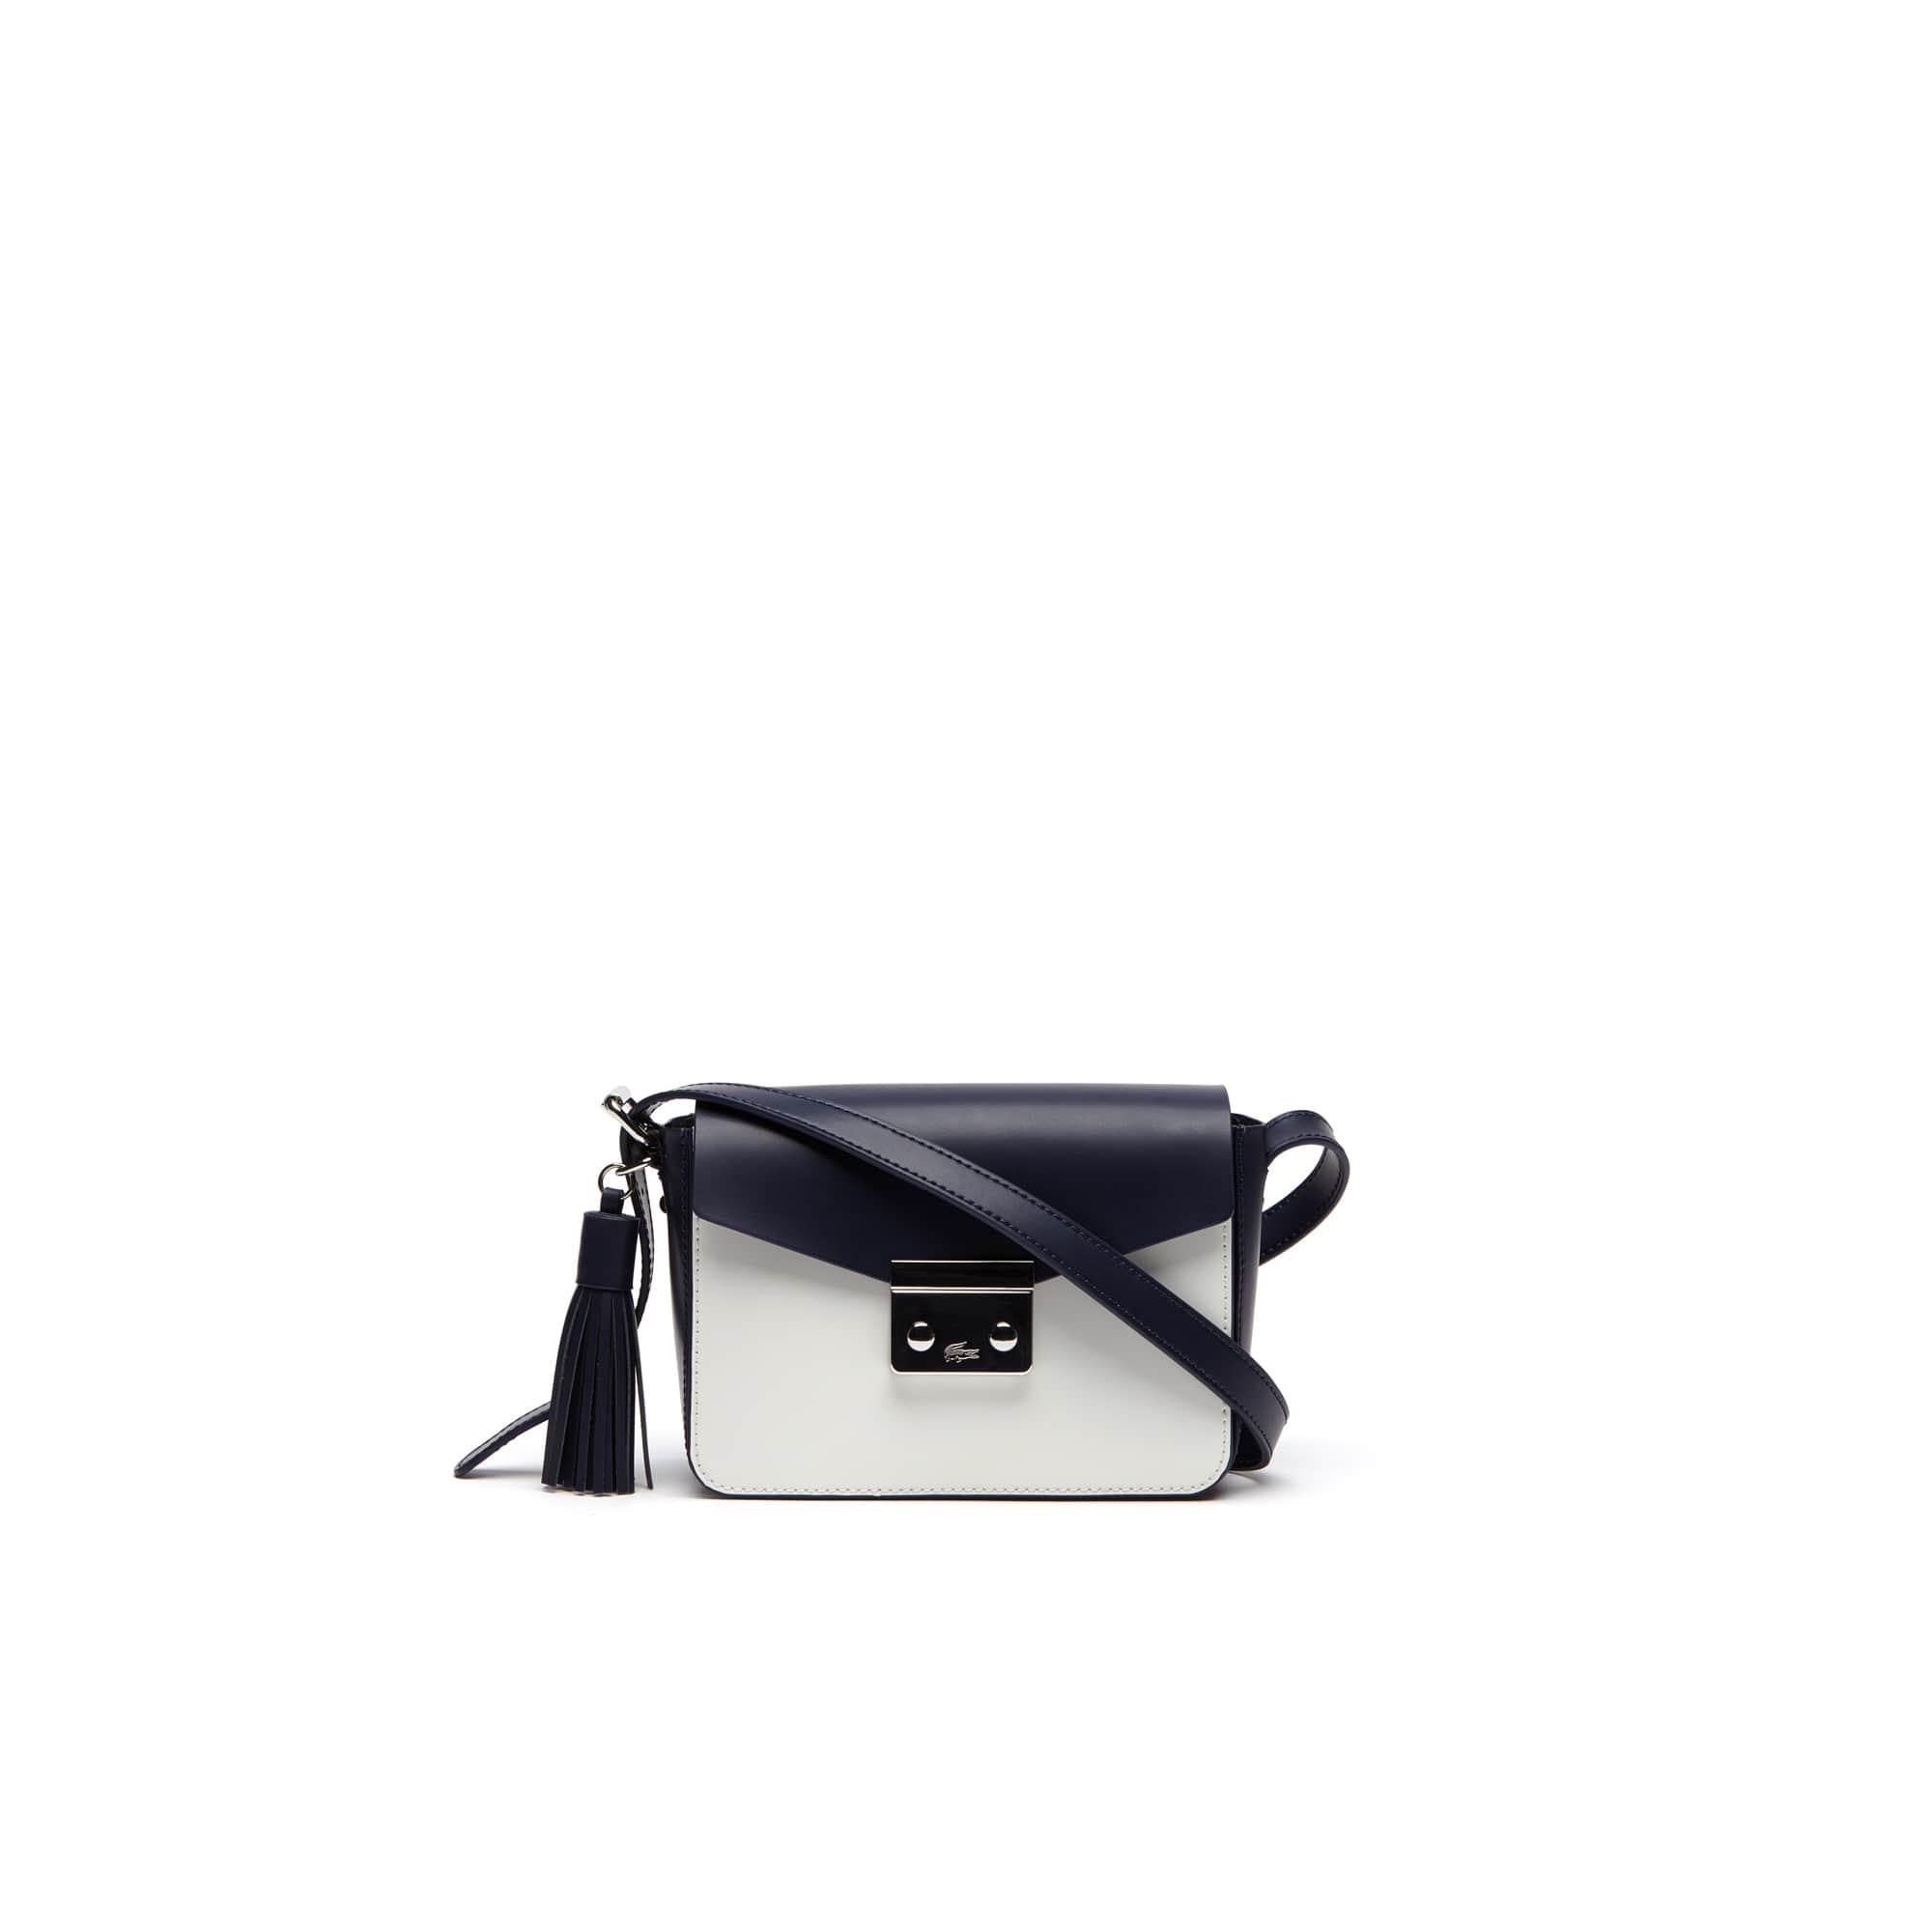 Bolsa tiracolo Lacoste LIVE feminina, revestida em couro e com formato Mini Tennis Square